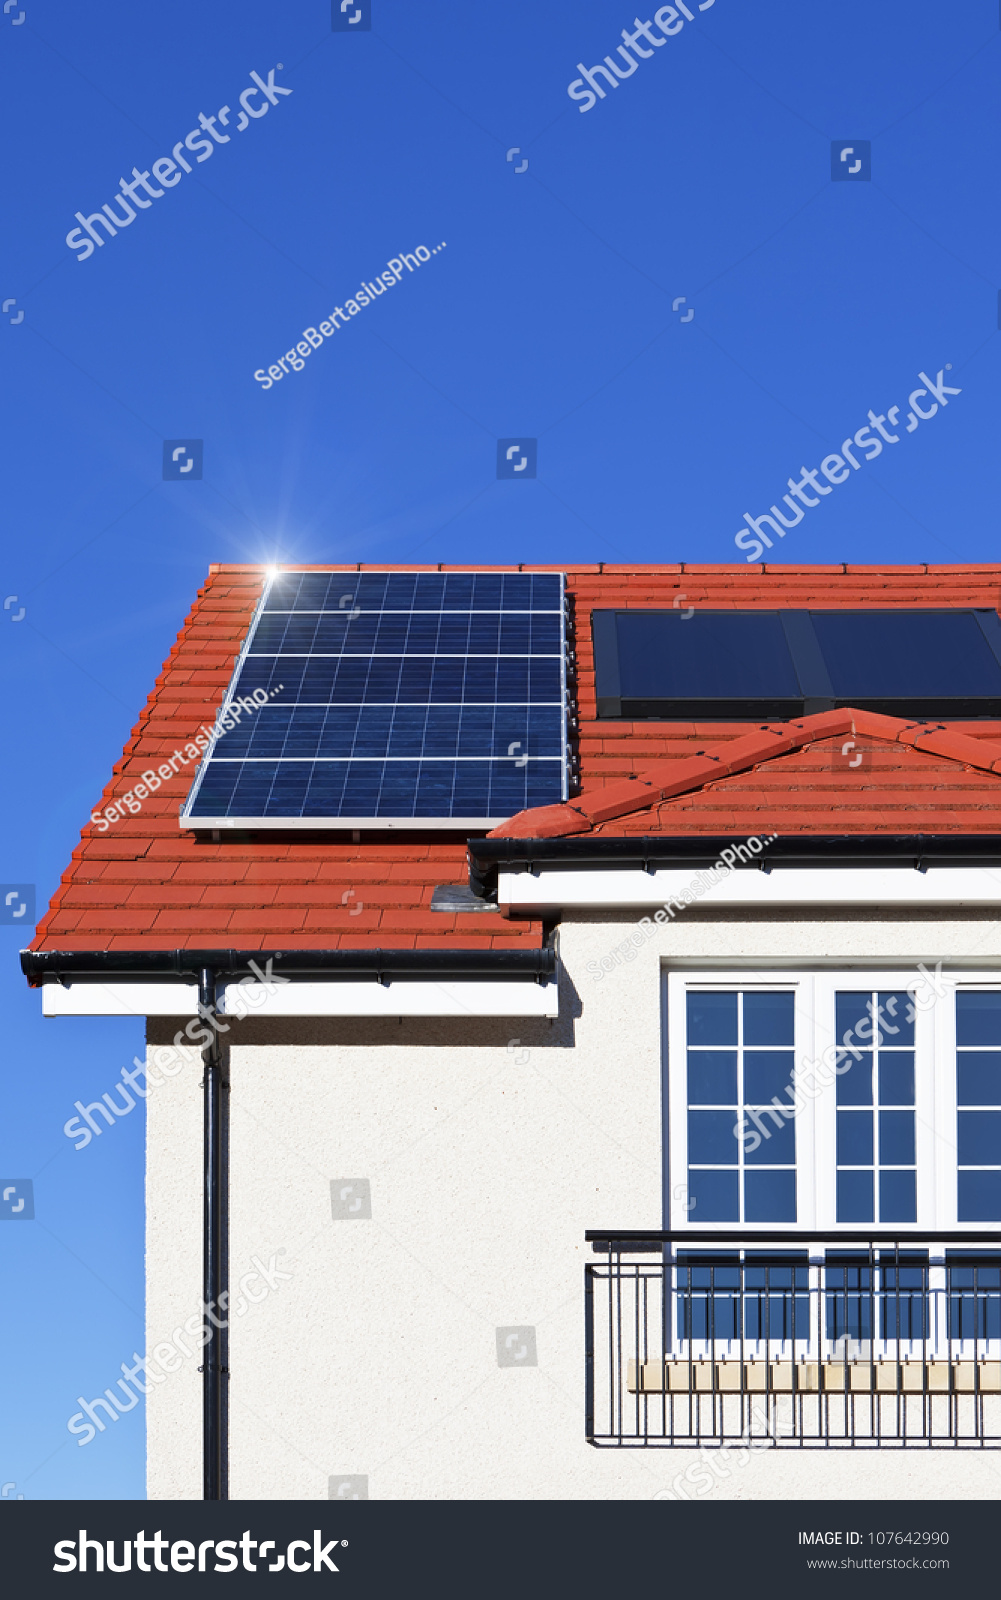 Alternative Energy Photovoltaic Solar Panels On Stock Photo ...